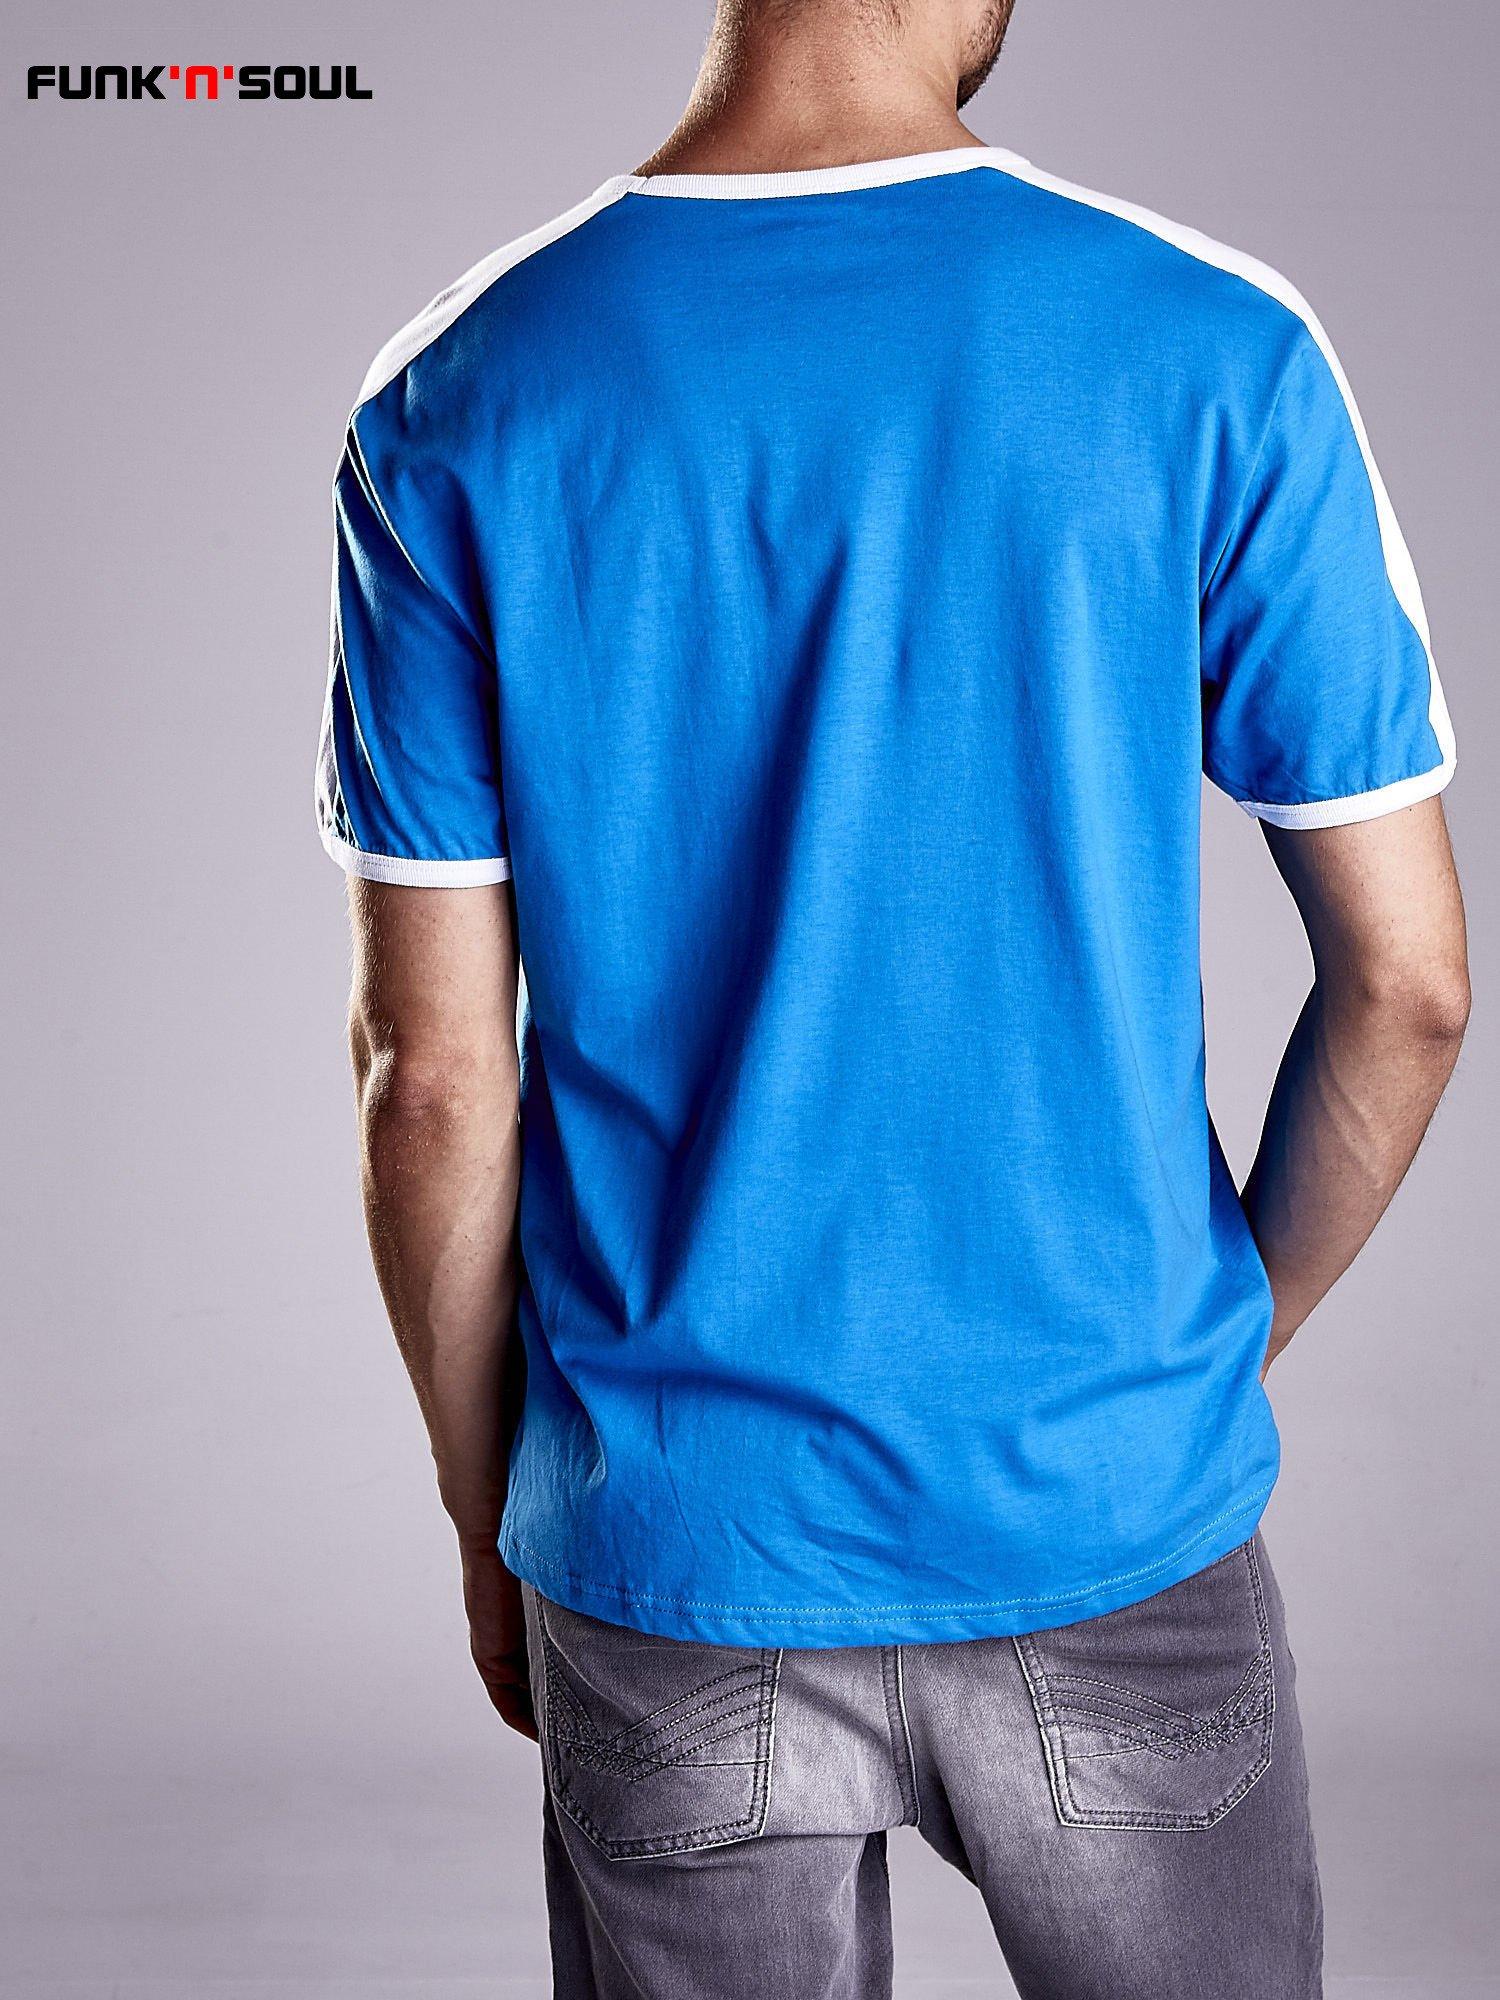 Niebieski t-shirt męski z napisem ITALIA Funk n Soul                                  zdj.                                  2